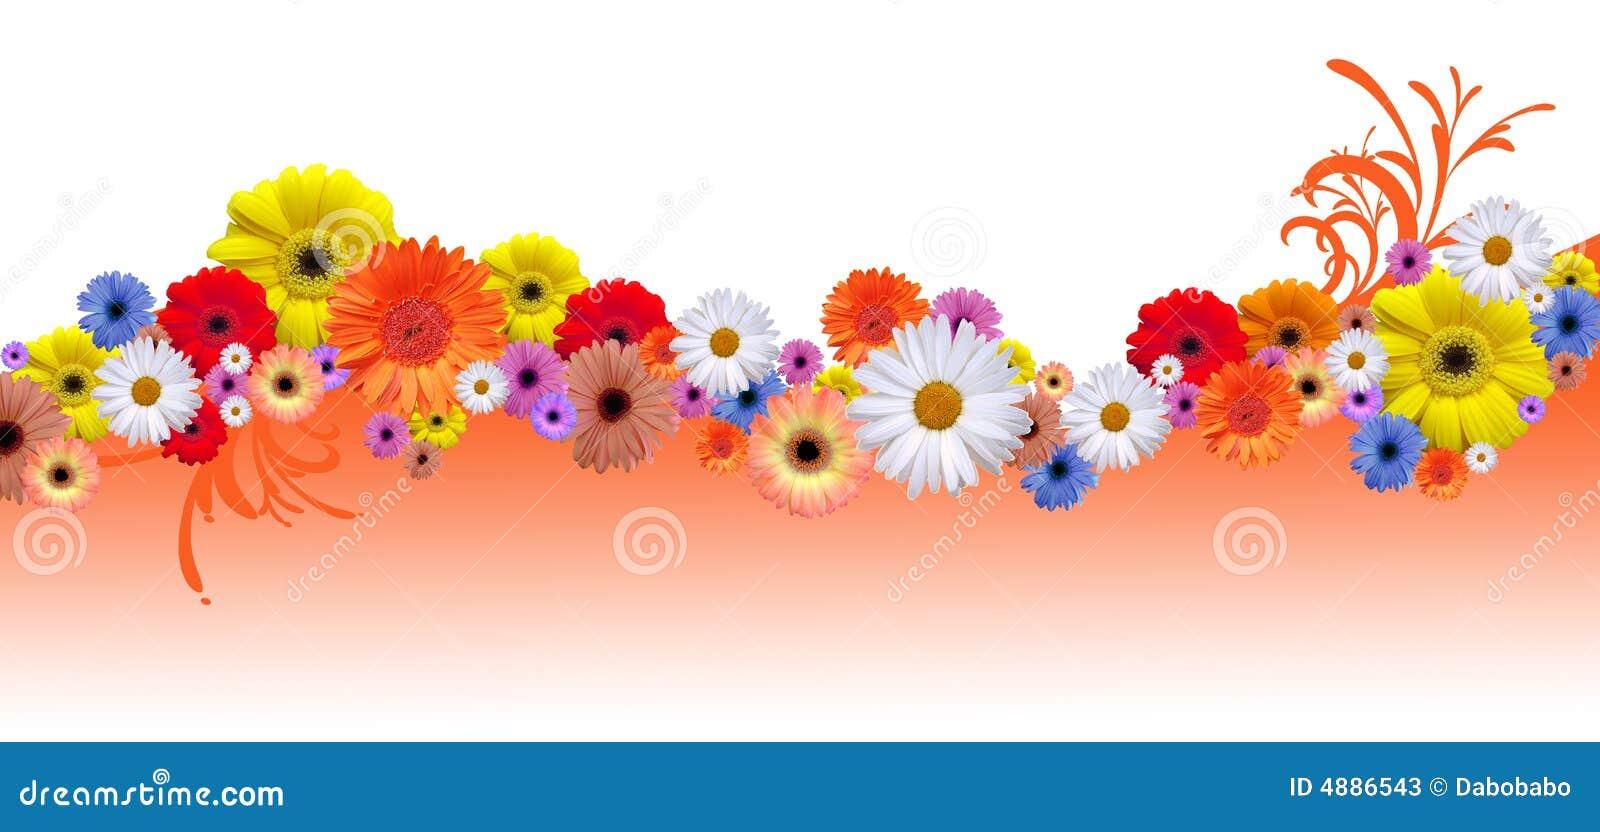 Ligne de fleur illustration stock illustration du for Vente des fleurs en ligne